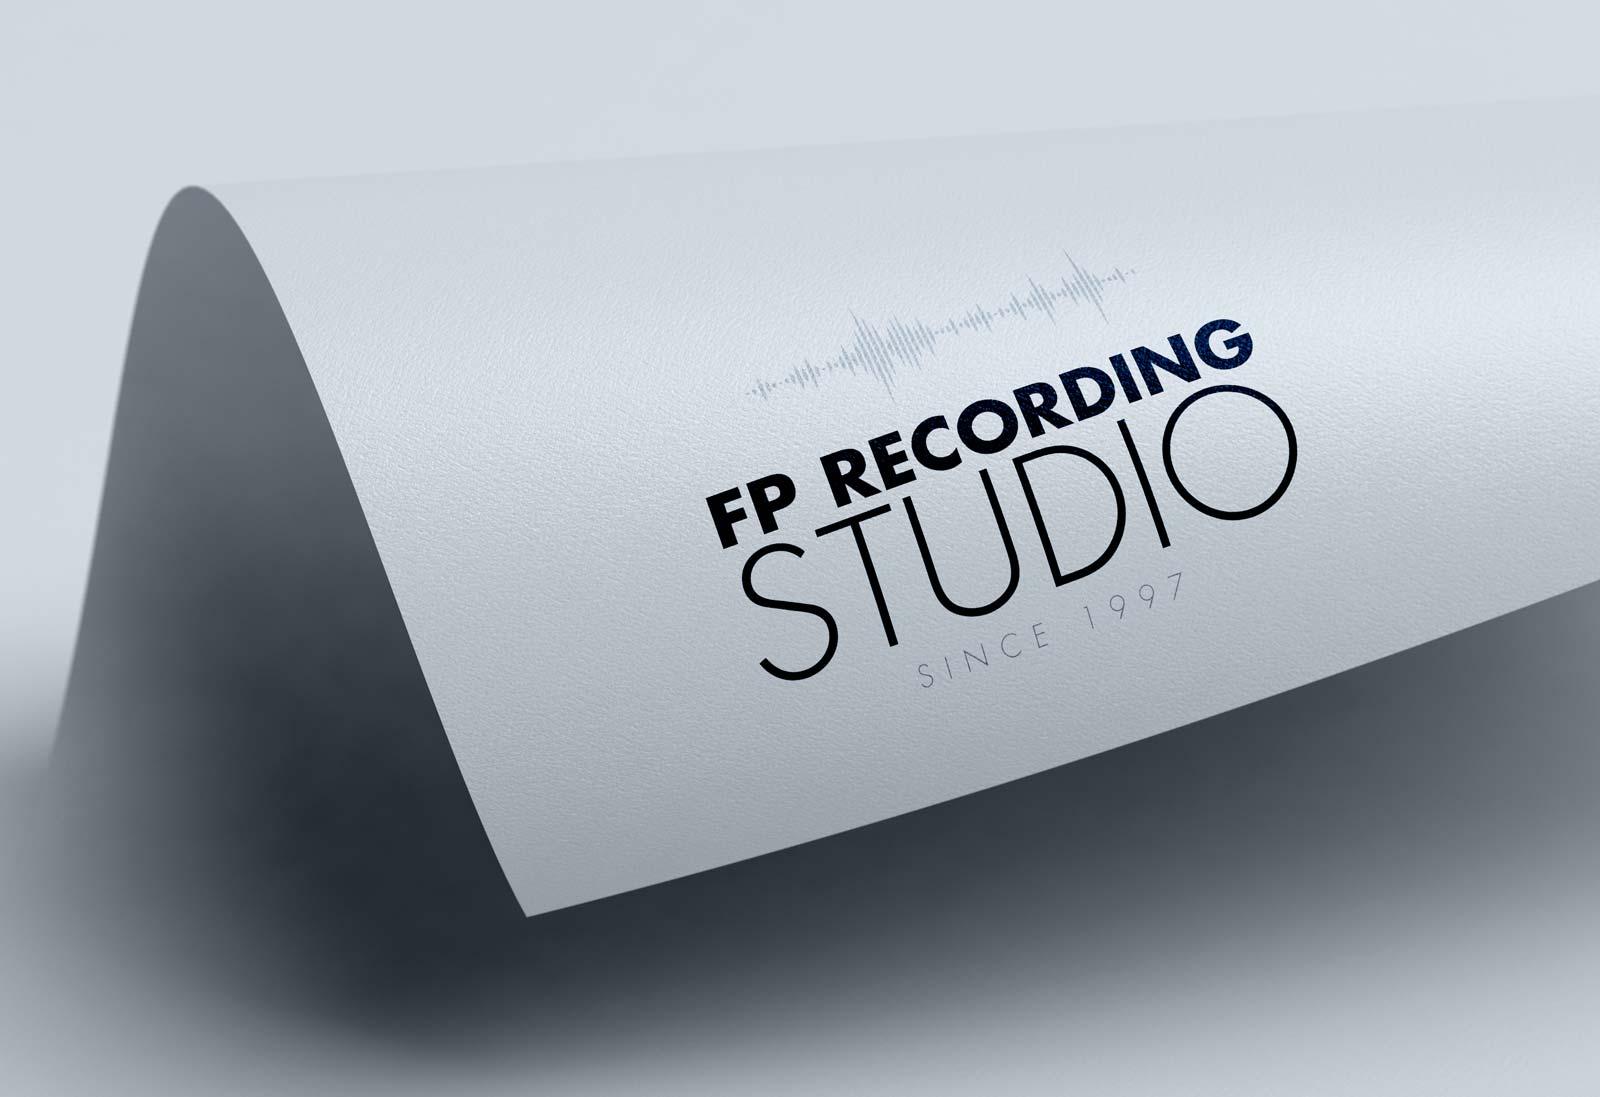 FP_recording_studio_logo